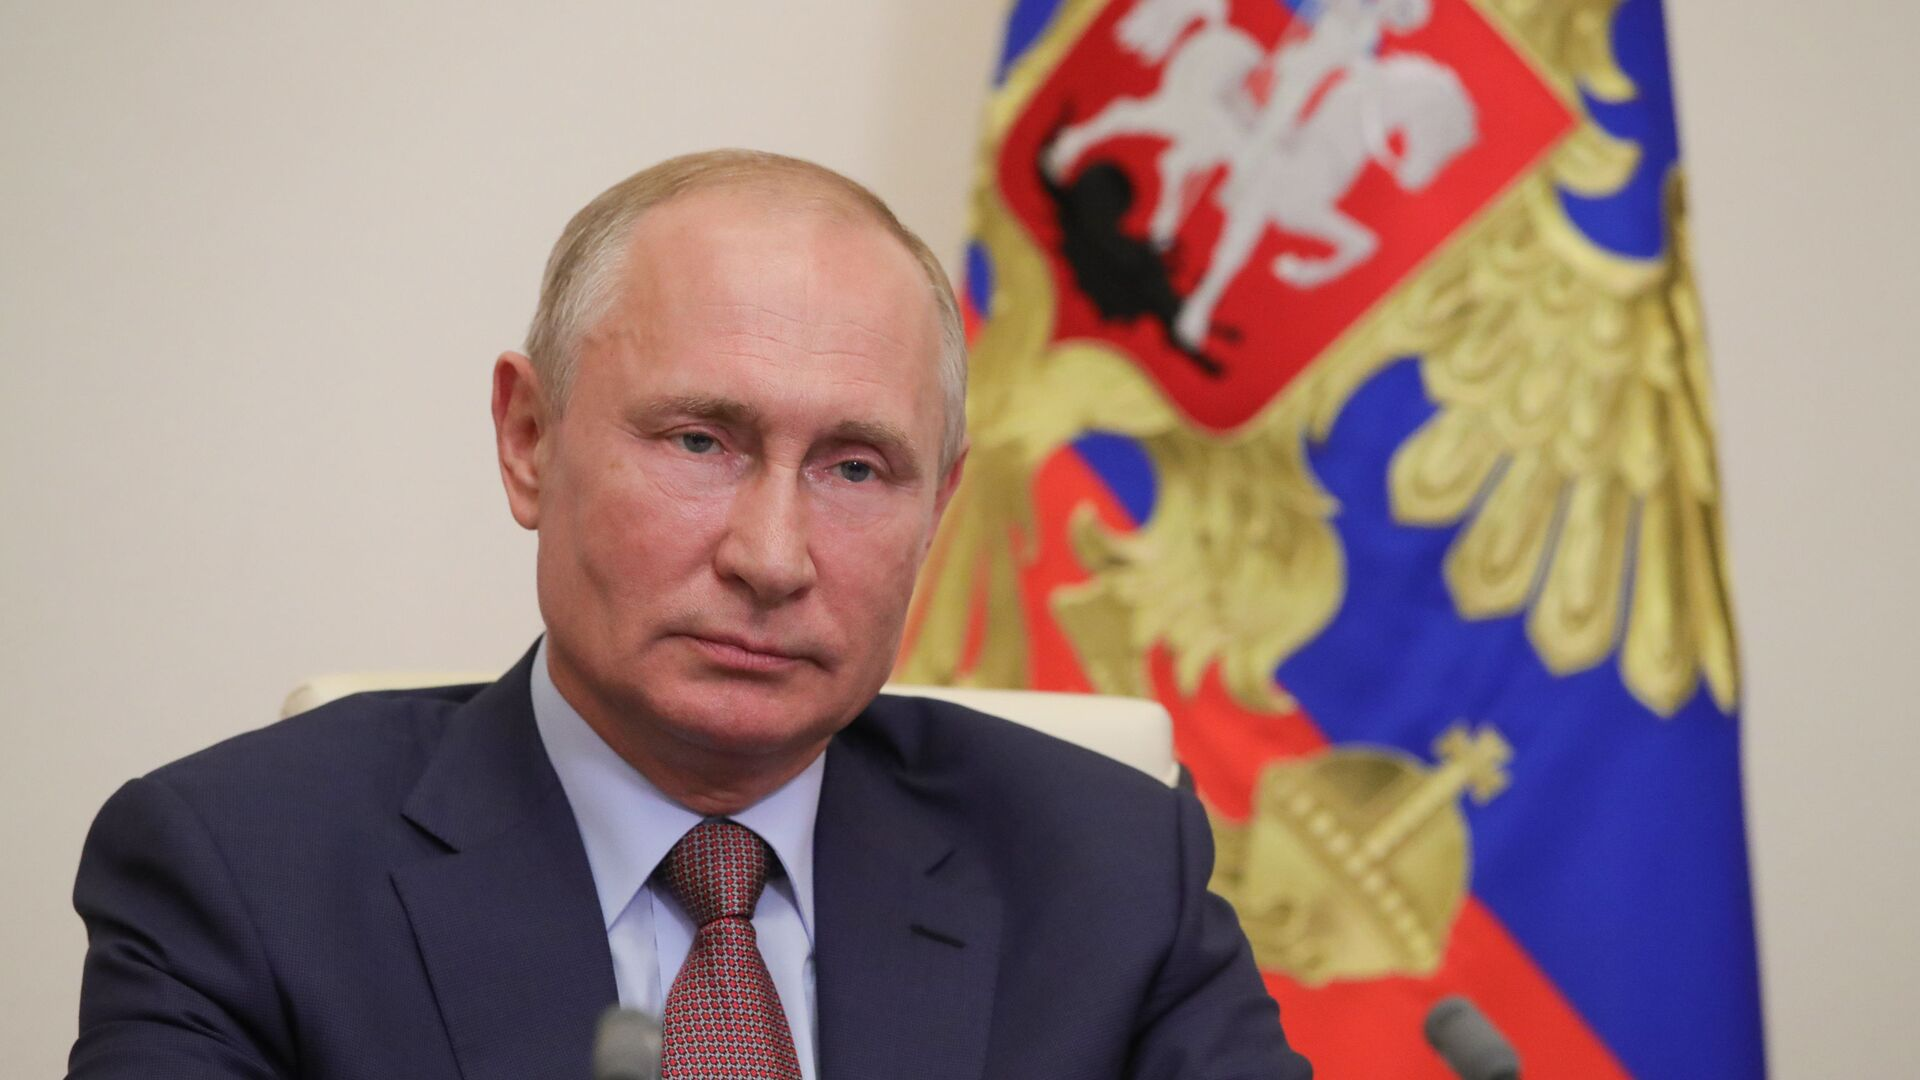 Vladímir Putin, presidente de Rusia - Sputnik Mundo, 1920, 02.07.2021